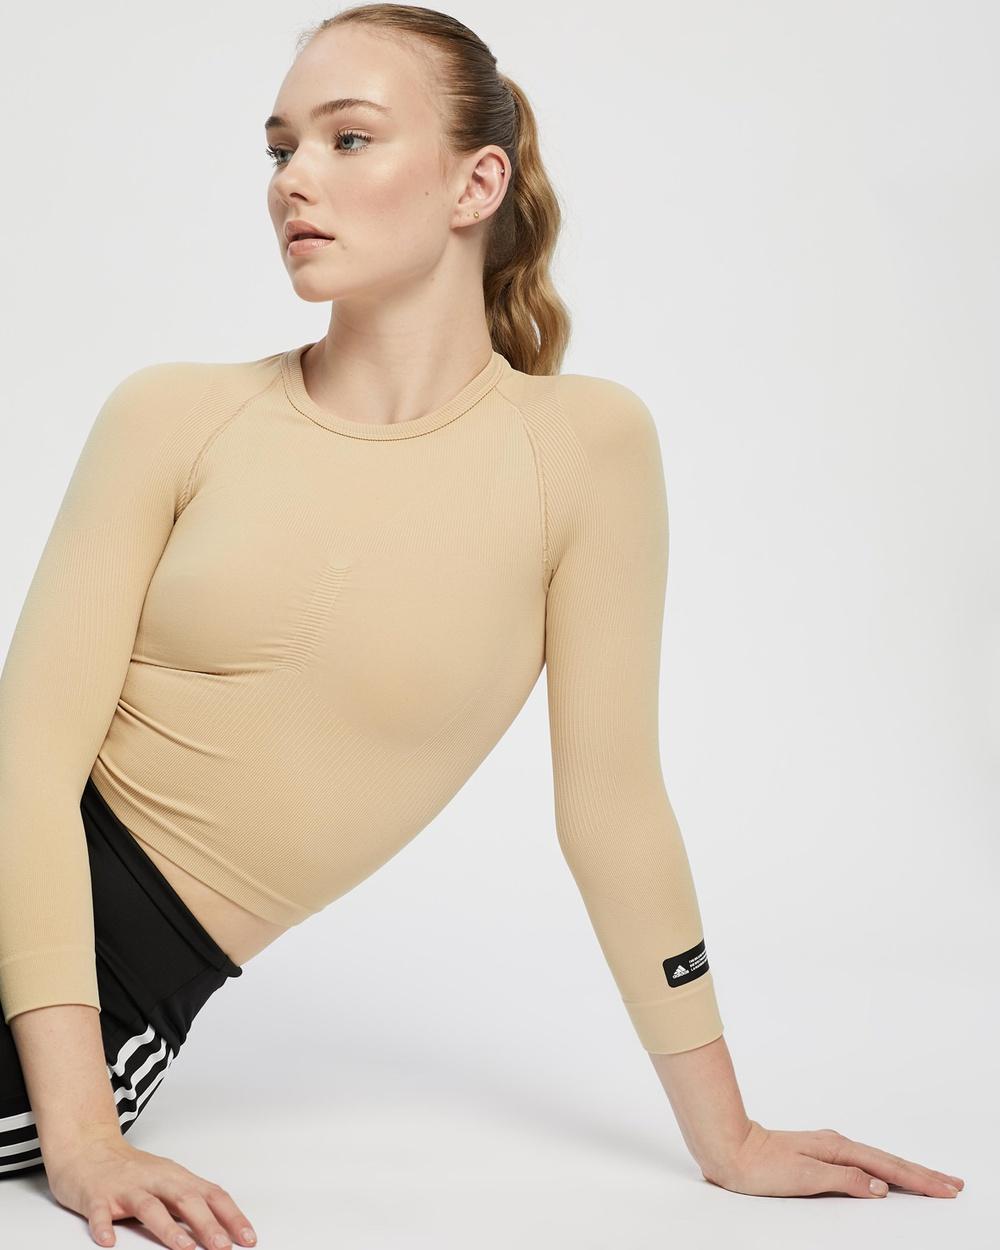 adidas Performance Formotion Cropped Training Tee Long Sleeve T-Shirts Hazy Beige